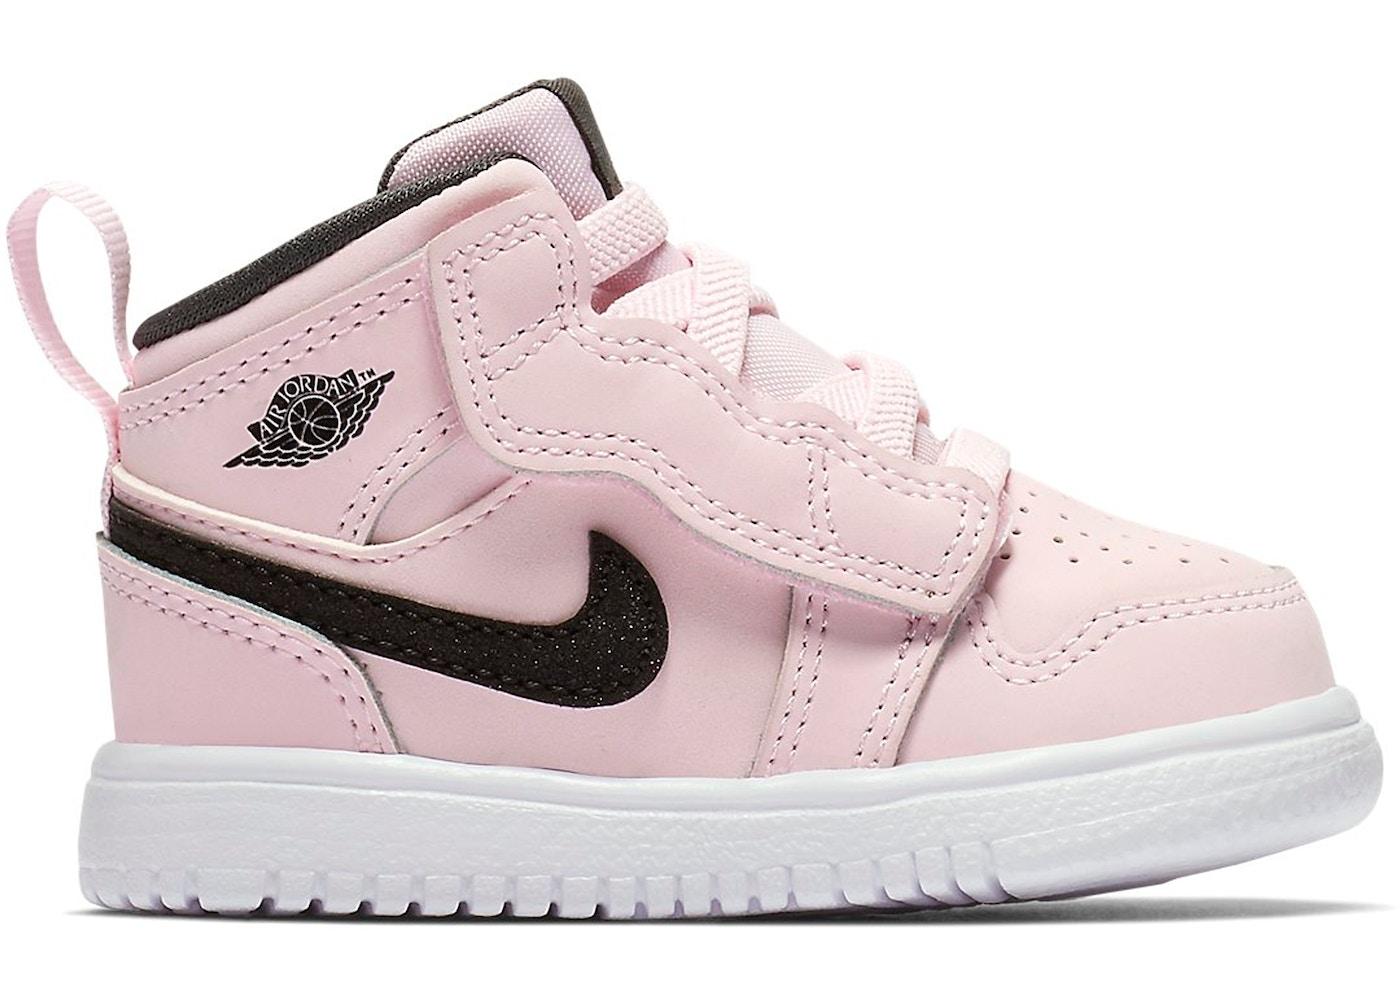 timeless design 843da d75b3 Air Jordan 1 Size 9 Shoes - Lowest Ask